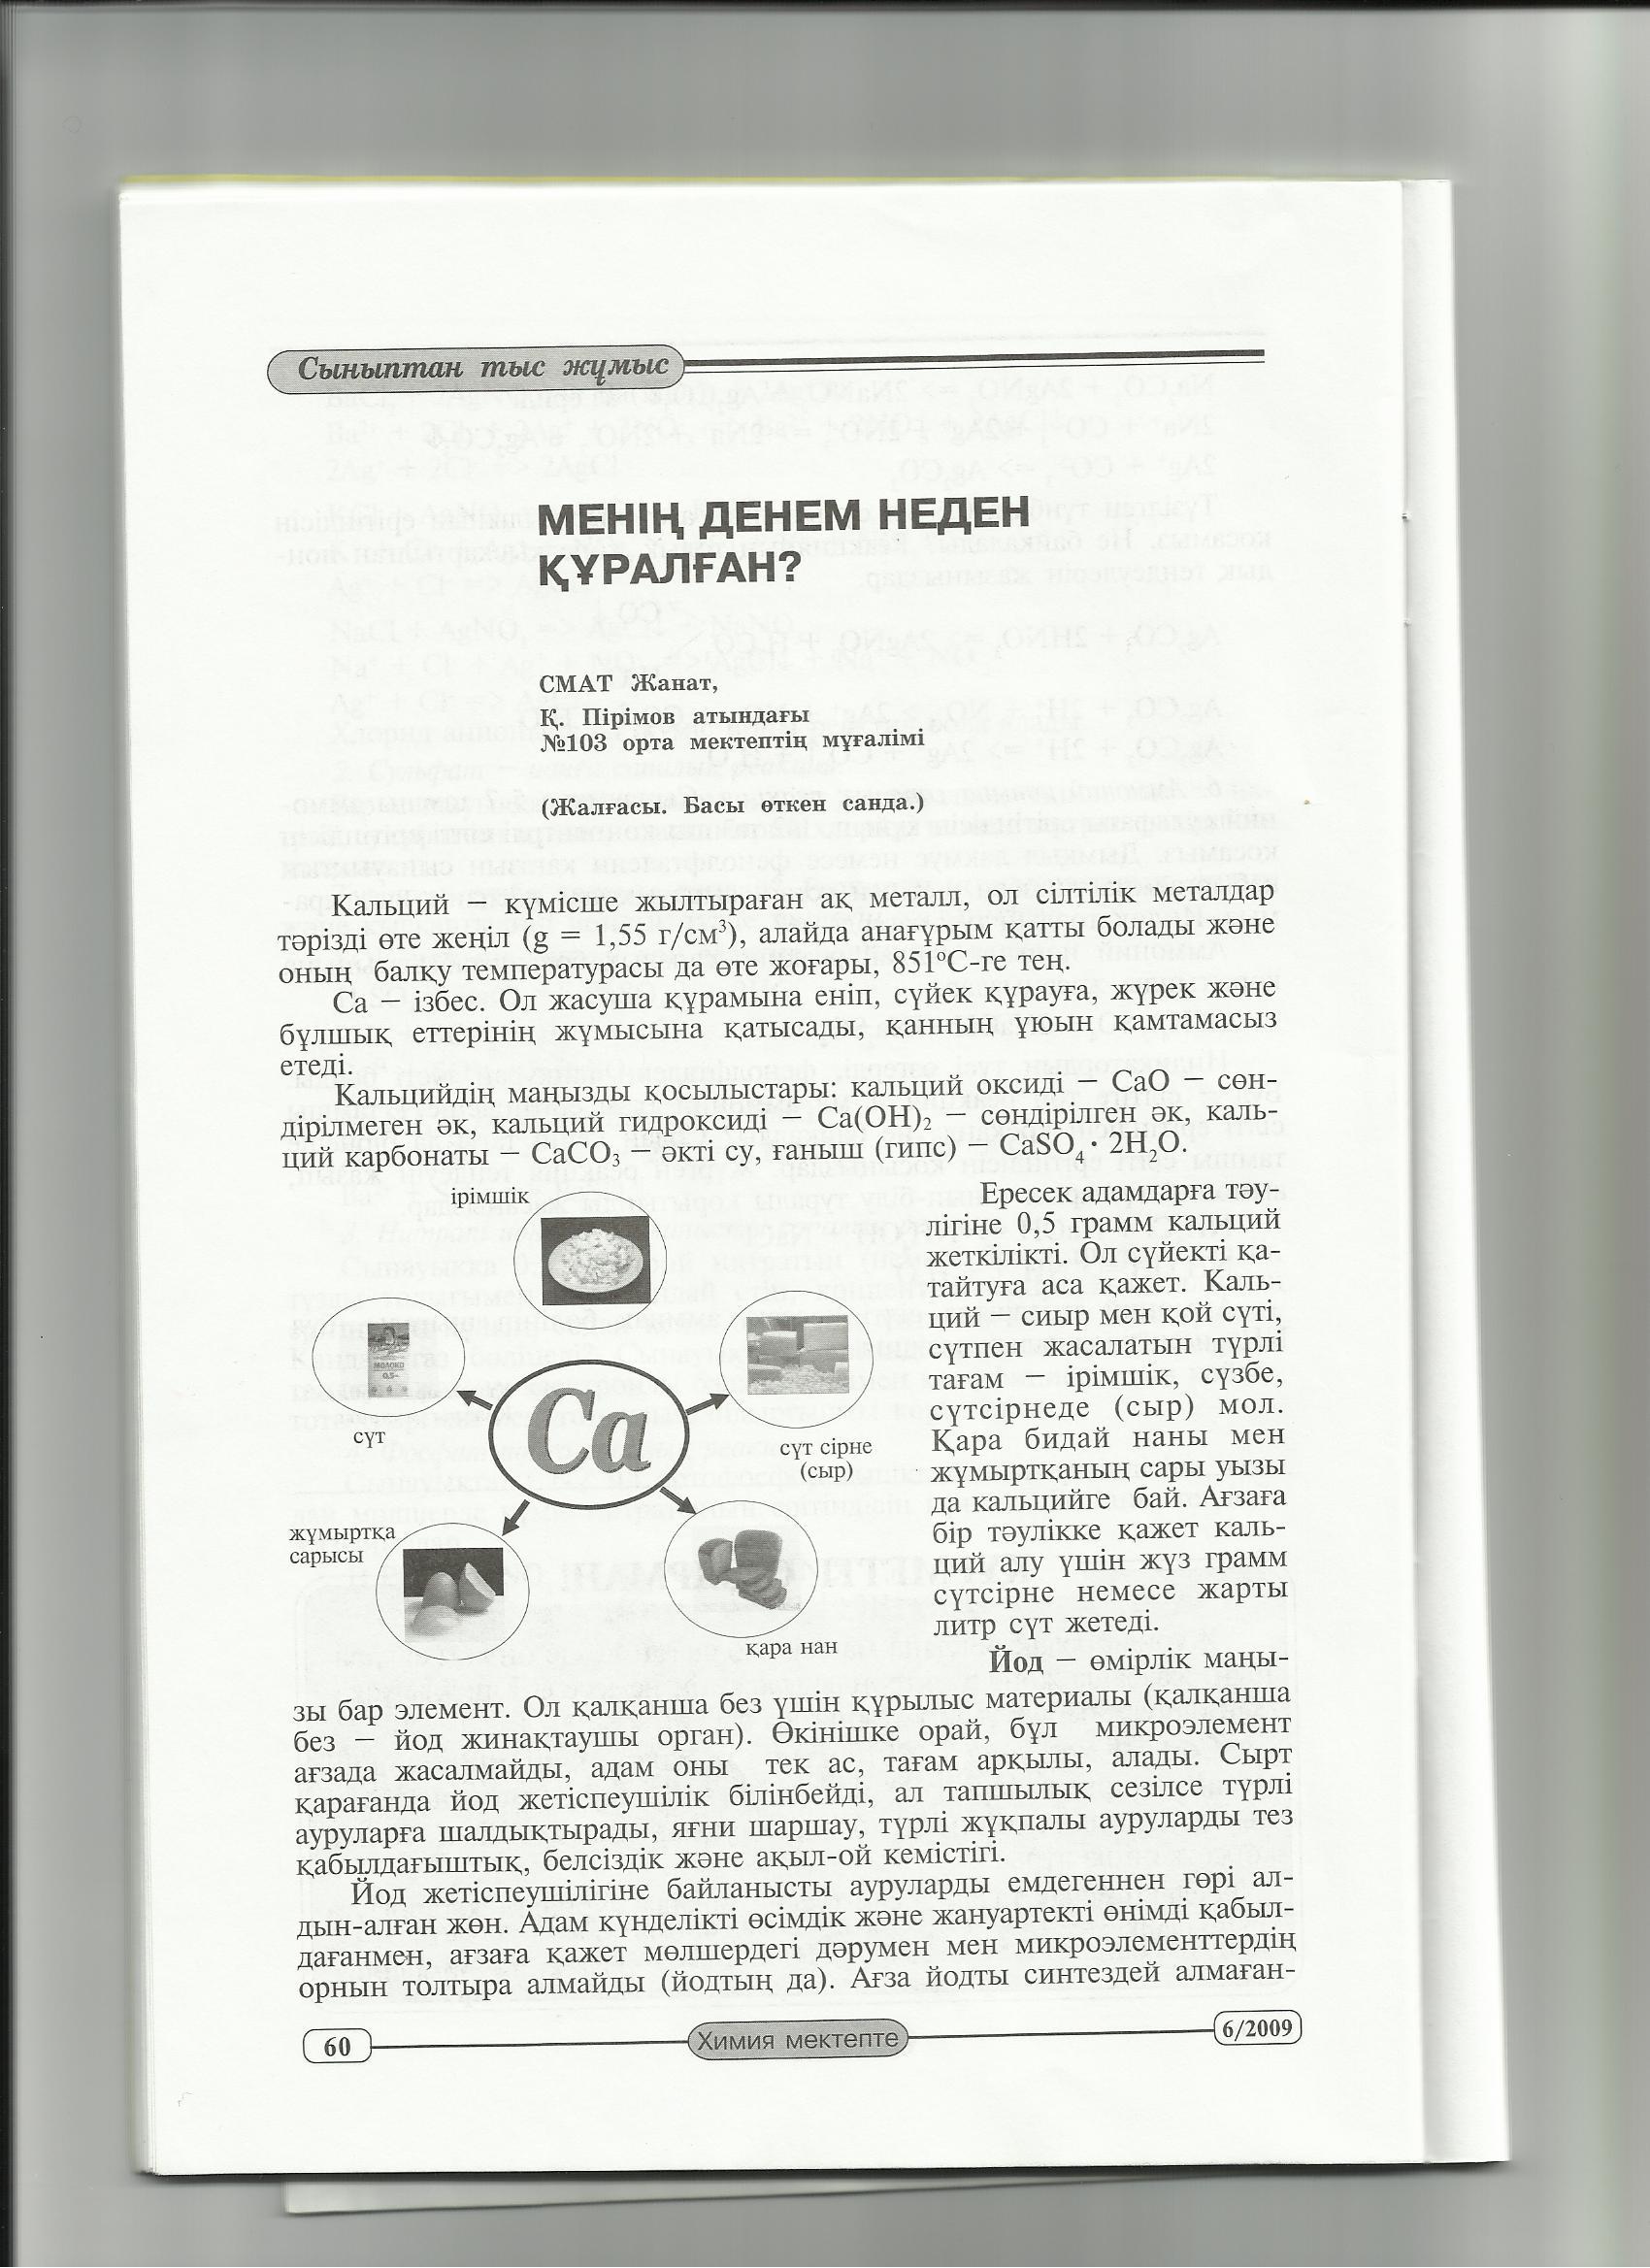 C:\Documents and Settings\Администратор\Рабочий стол\Новая папка (3)\11.jpg